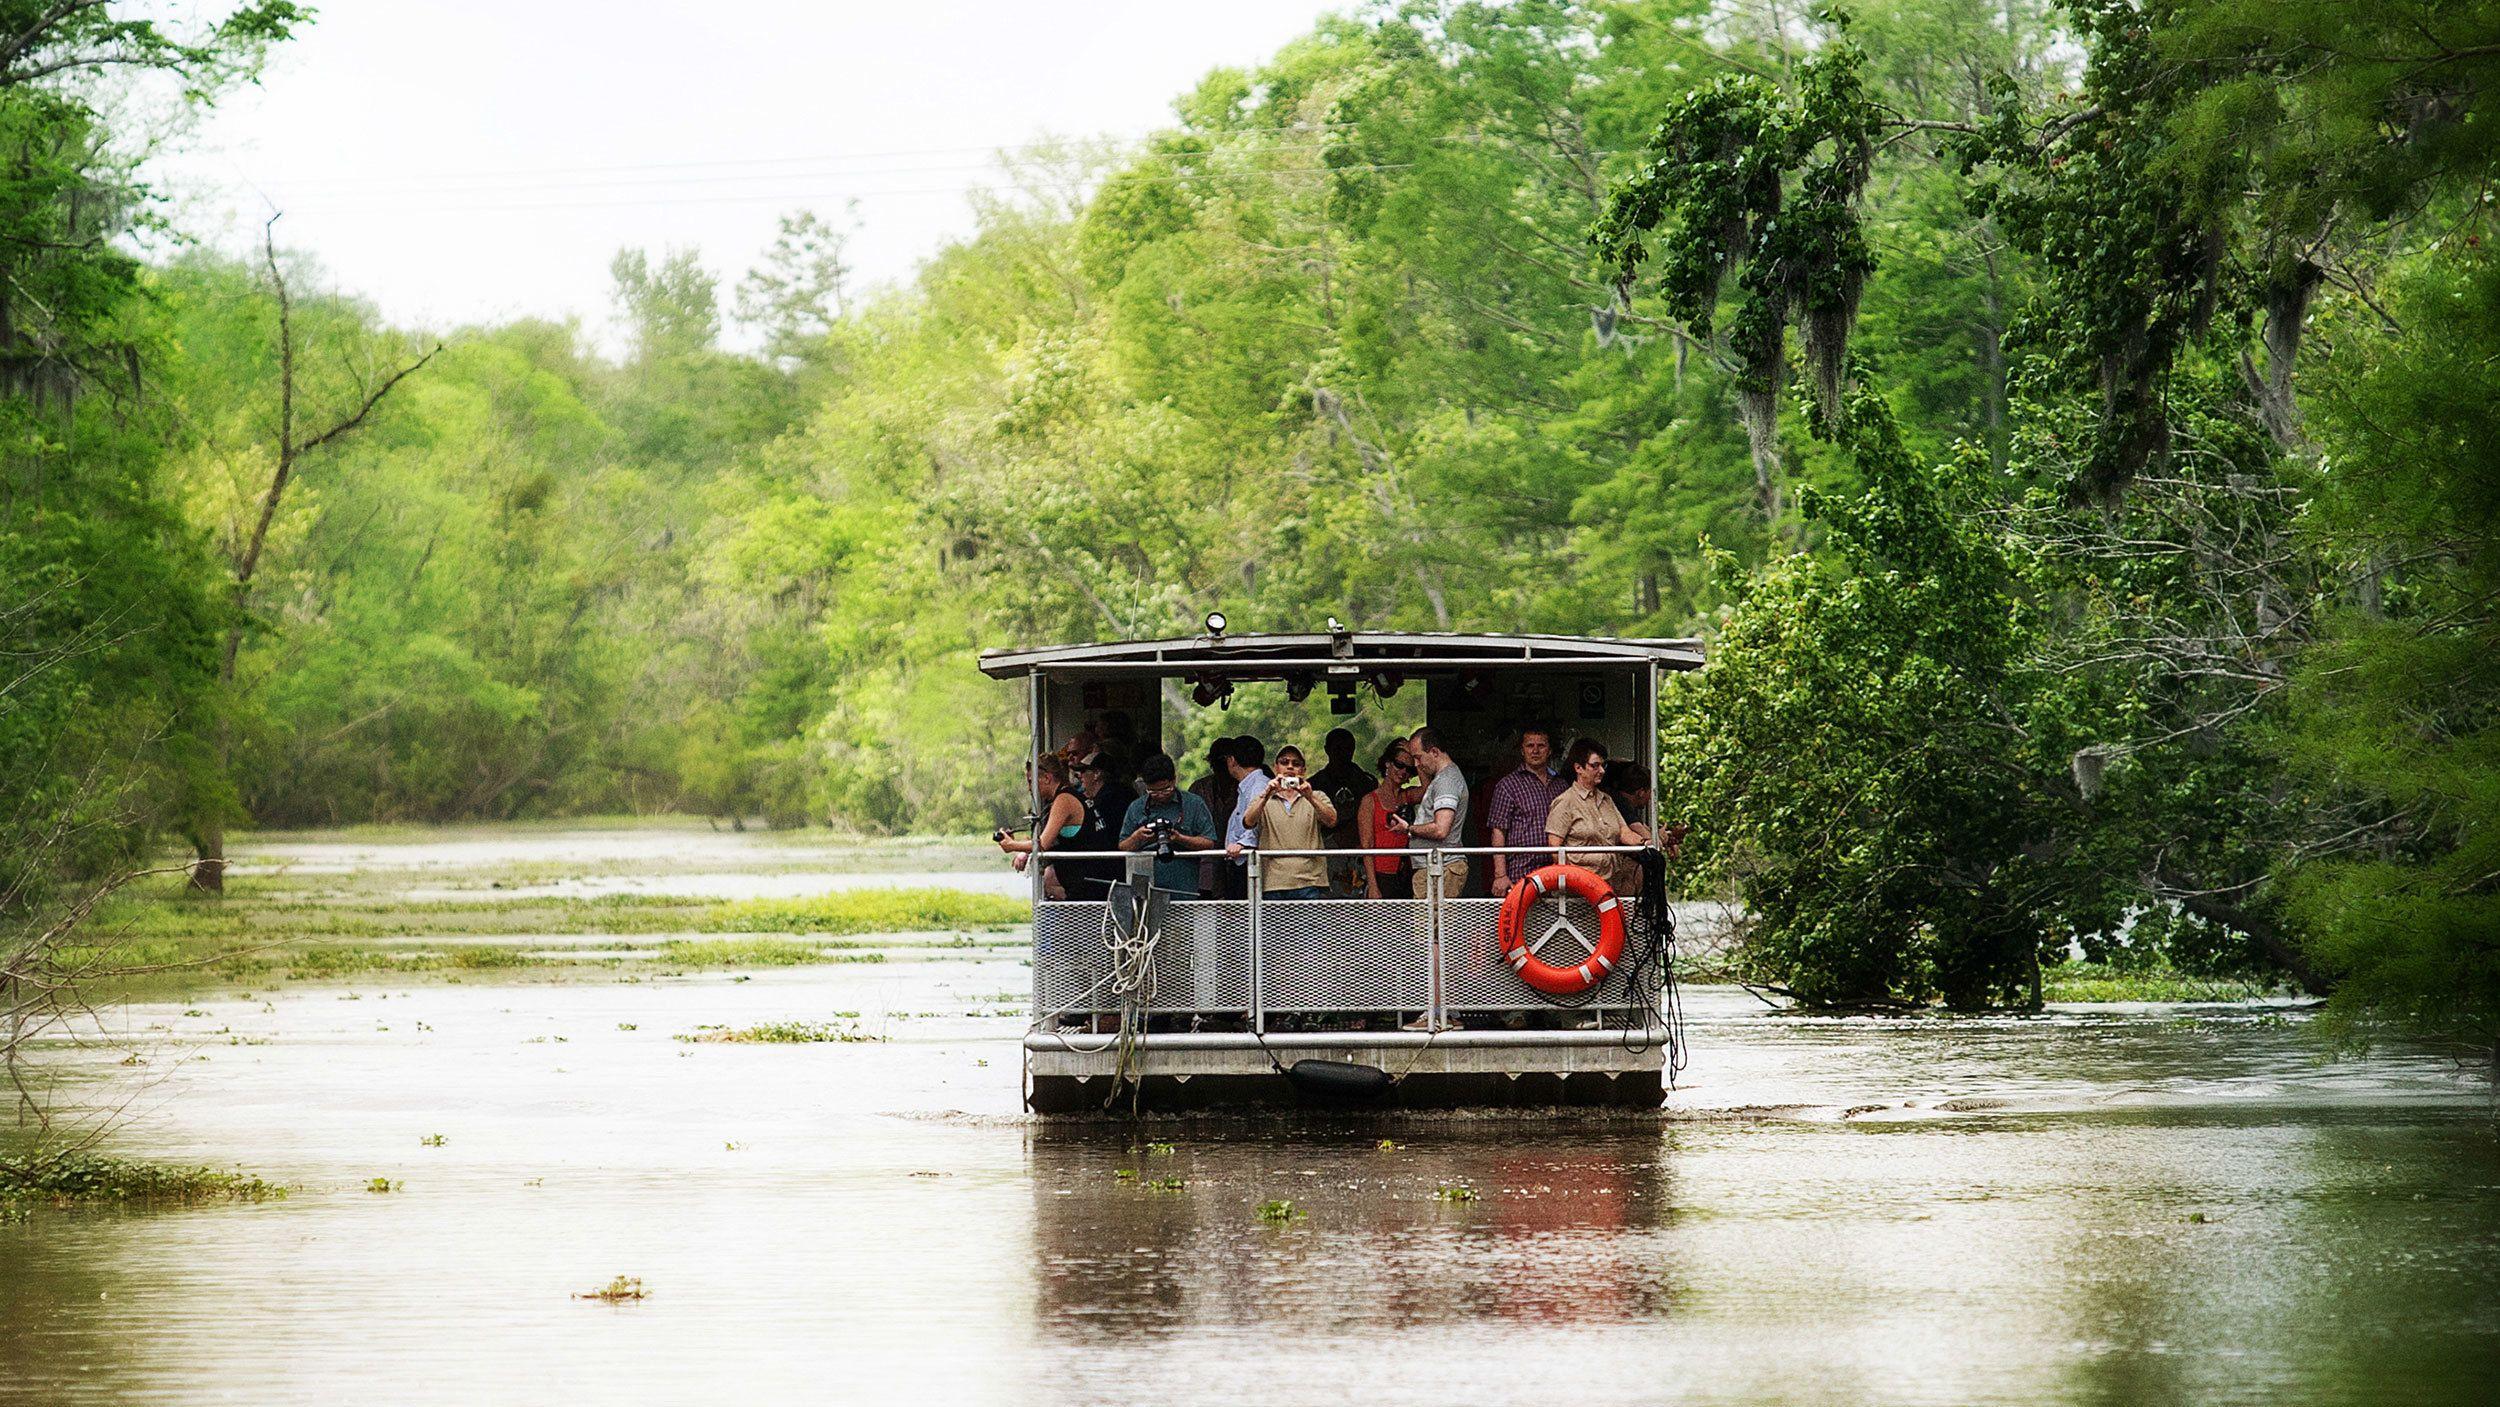 swamp boat on lake in bayou in New Orleans